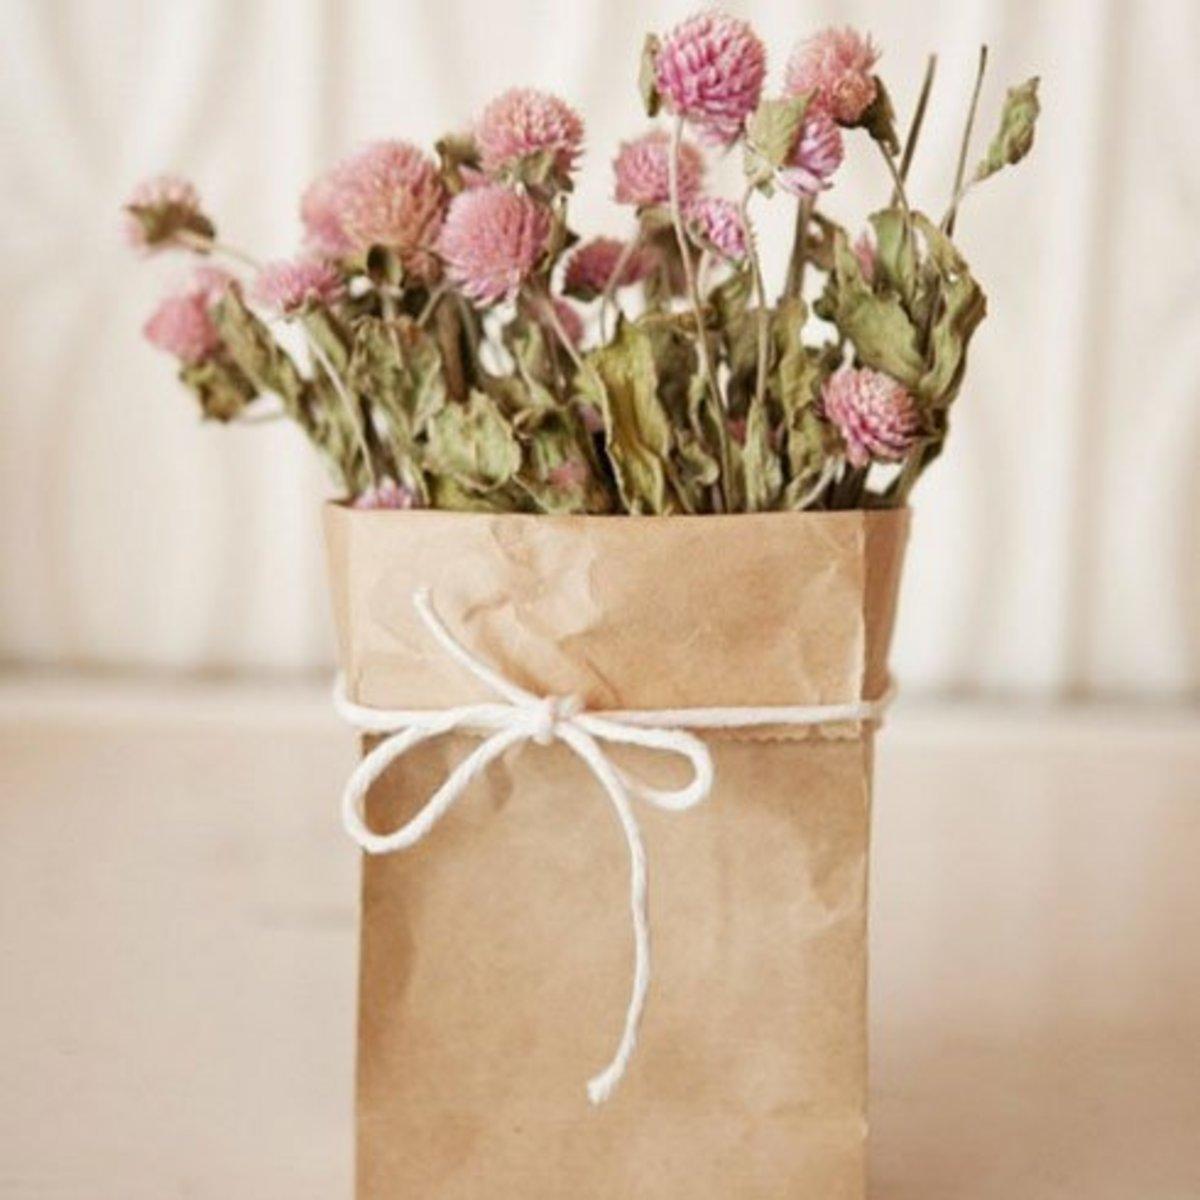 DIY Wedding Table Decoration Ideas   Paper Bag Vase   Click Pic for 20 Easy DIY Wedding Decorations